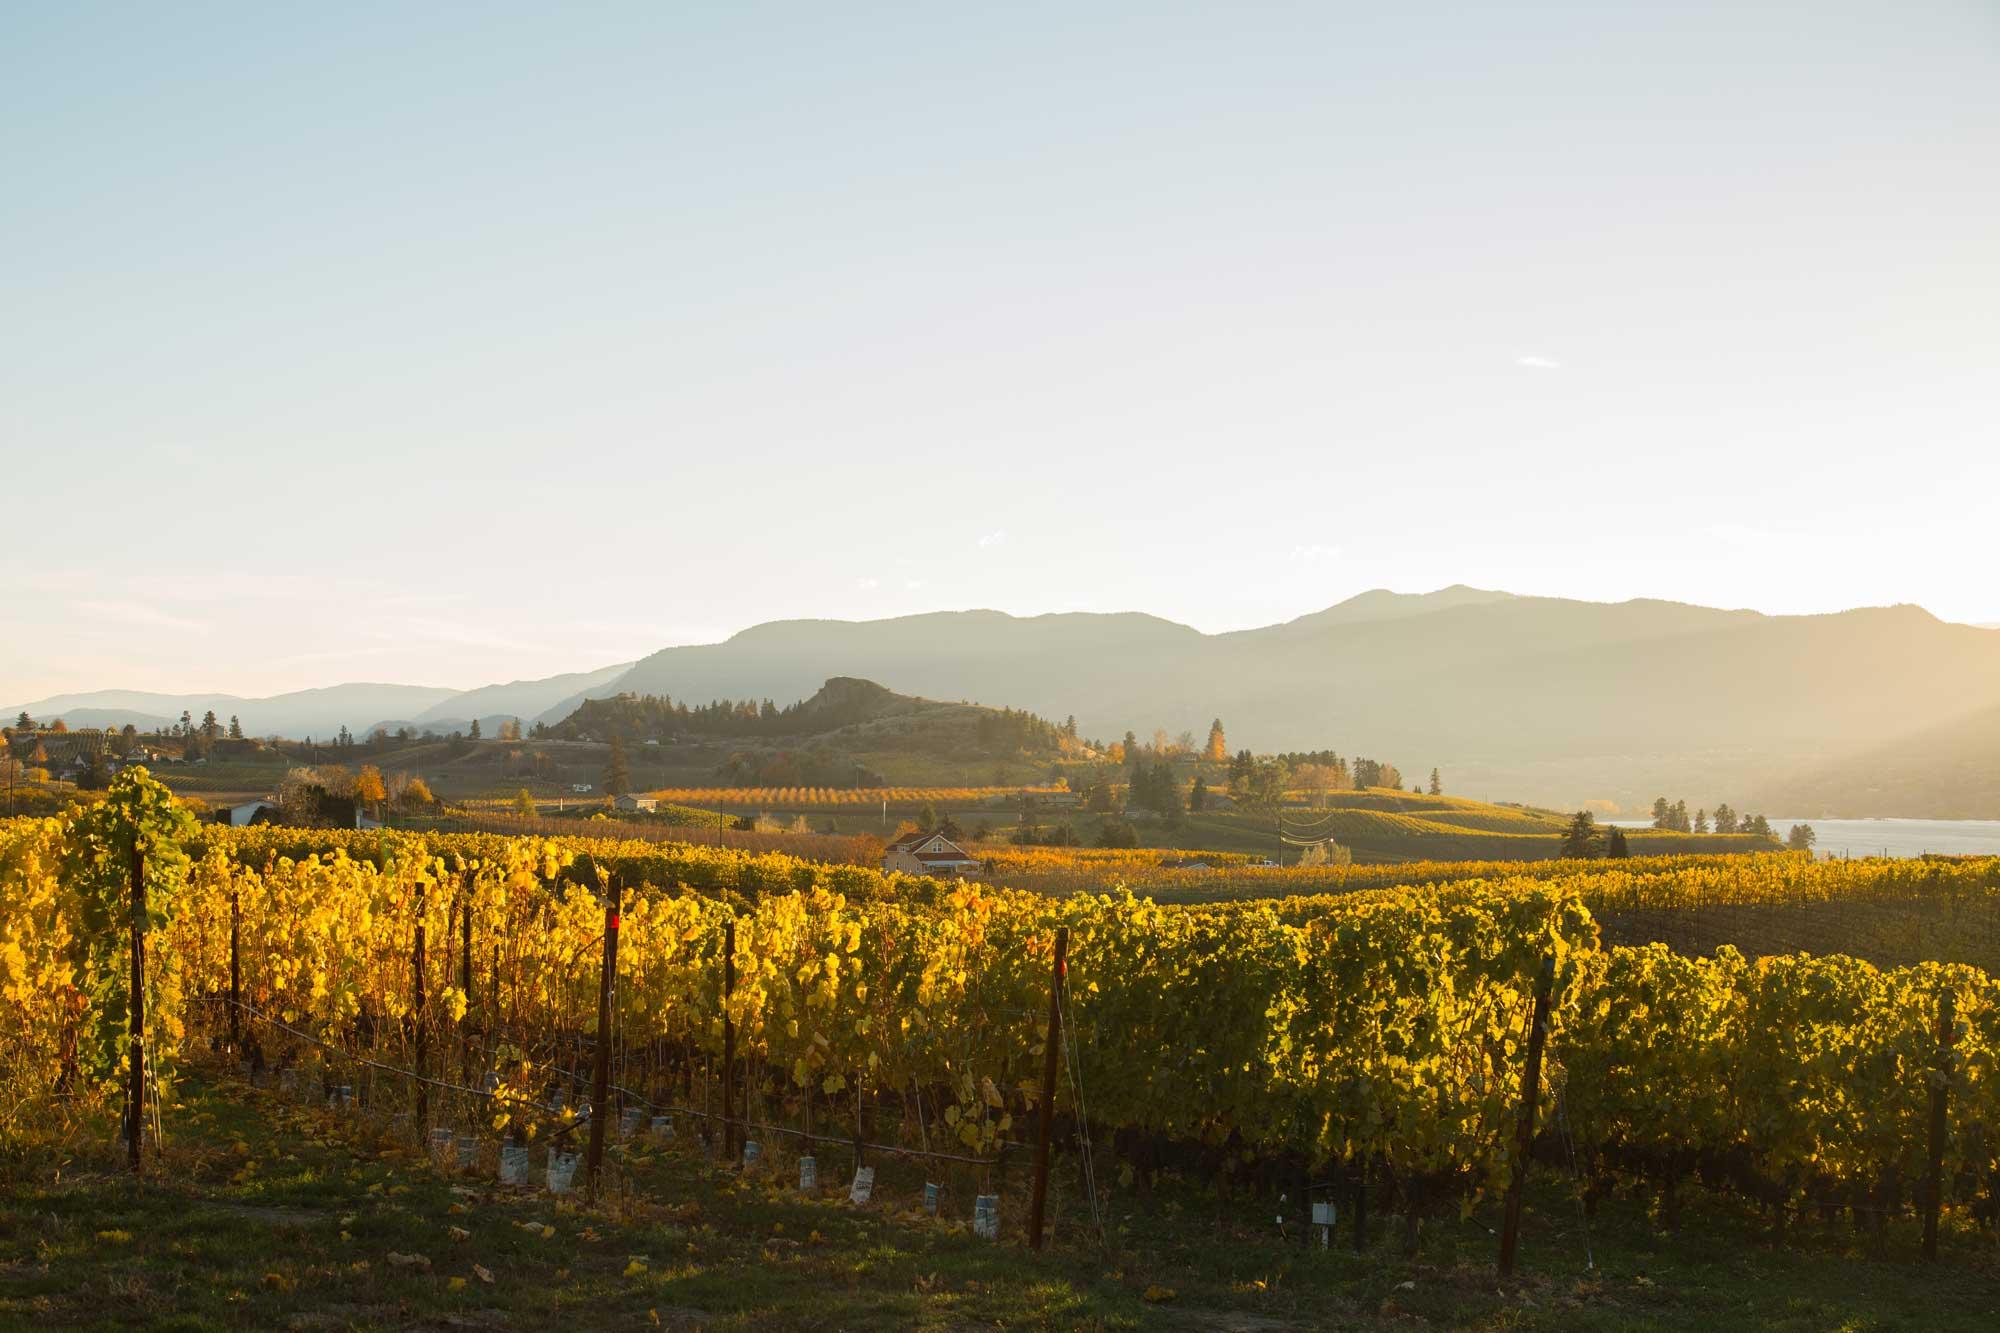 wine-photographer-chris-stenberg-0472.jpg